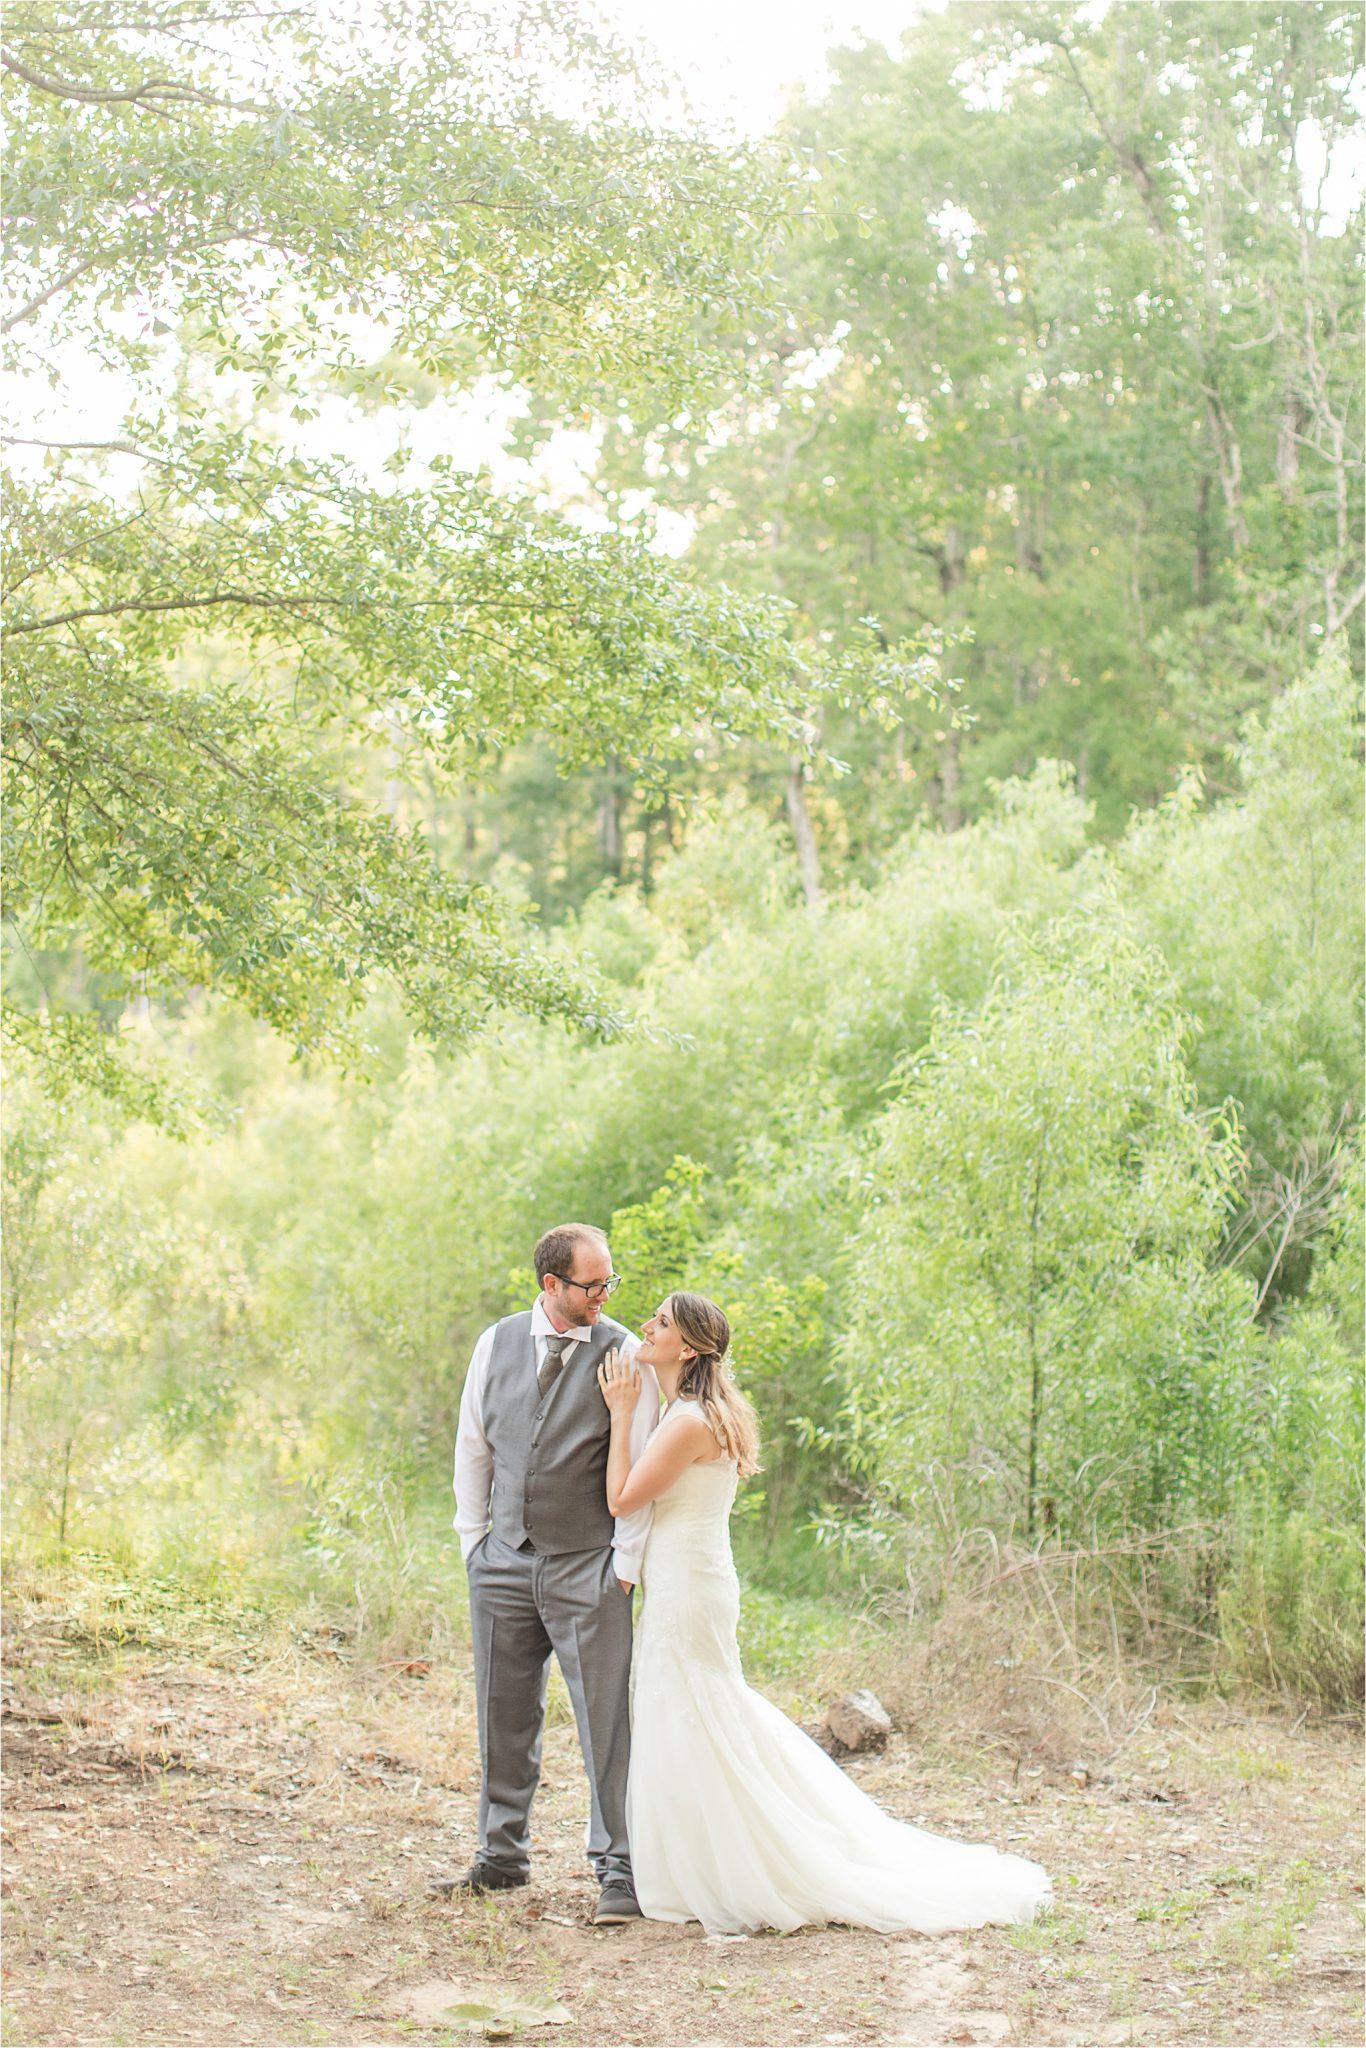 photos of the bride and groom-grey suit-groom in vest-backyard country wedding